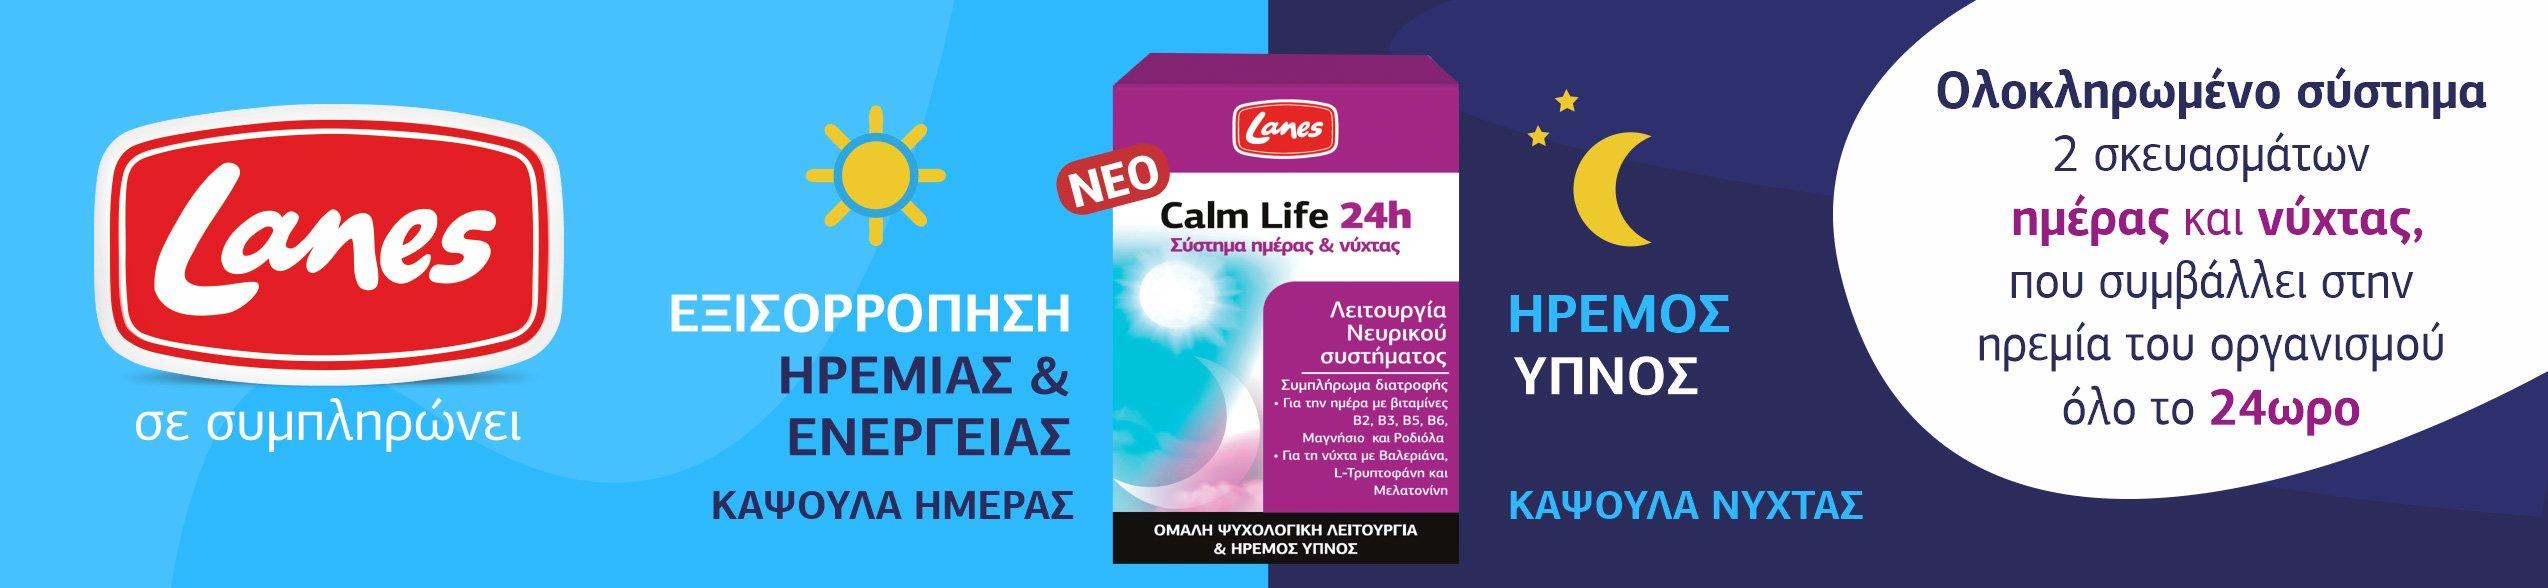 lanes calm life